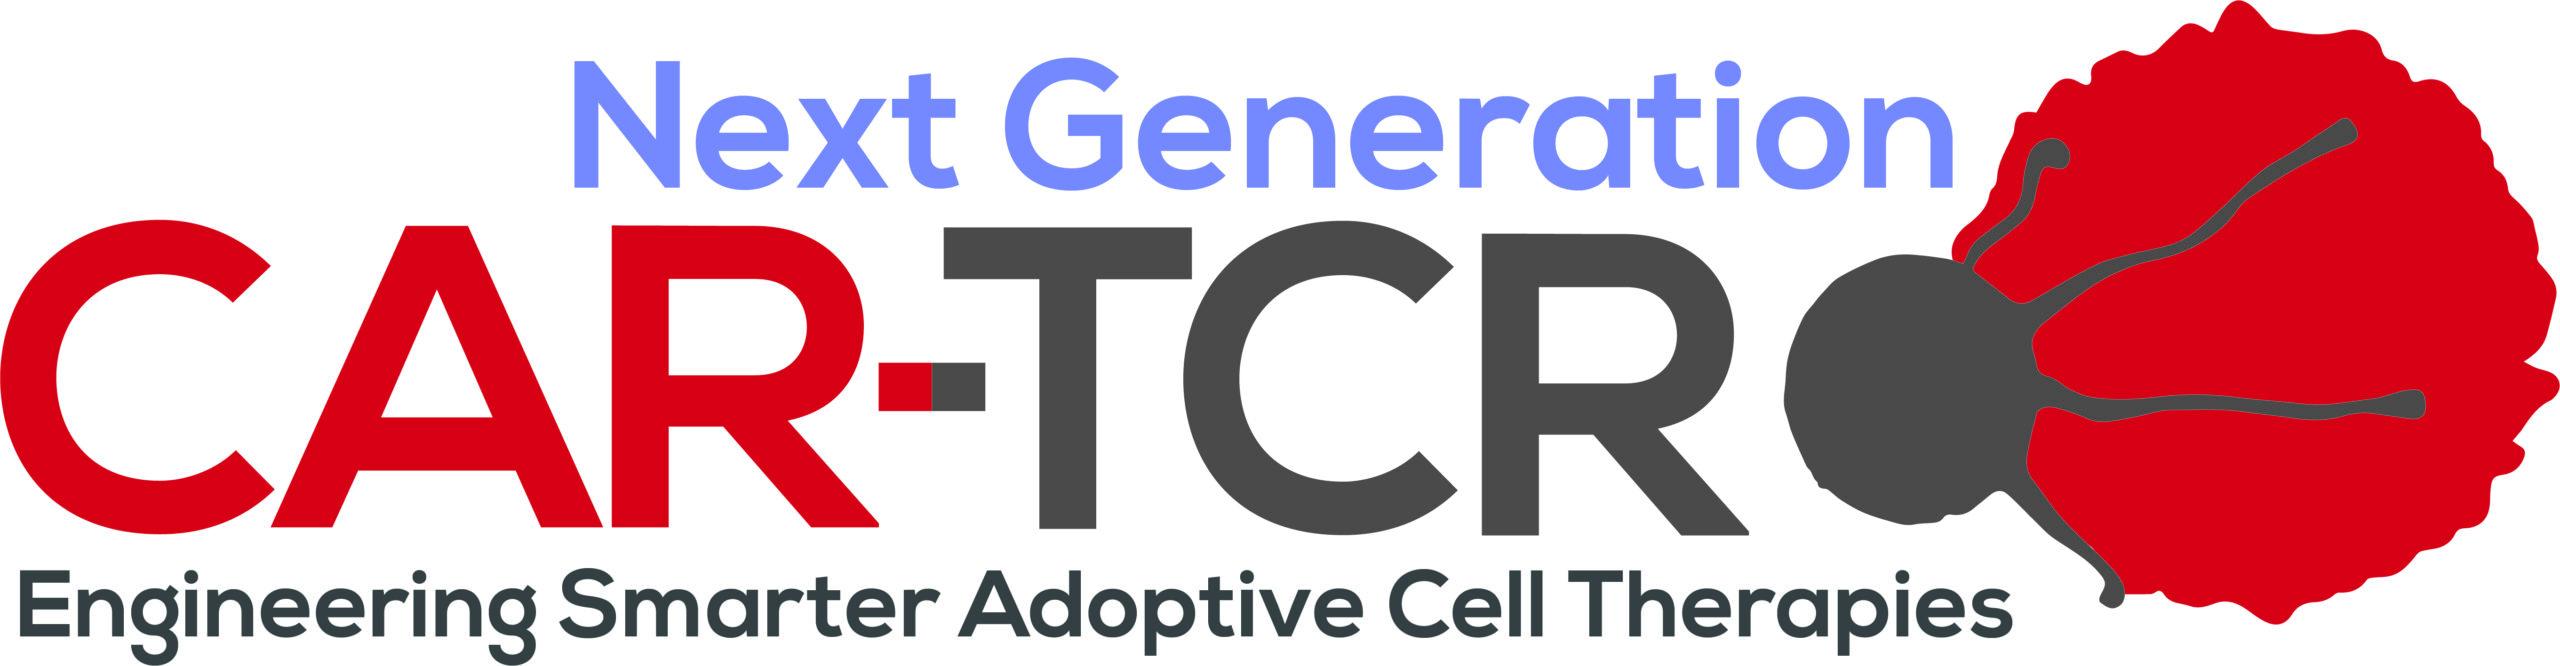 HW210915 Next Gen CAR-TCR Summit logo - Copy